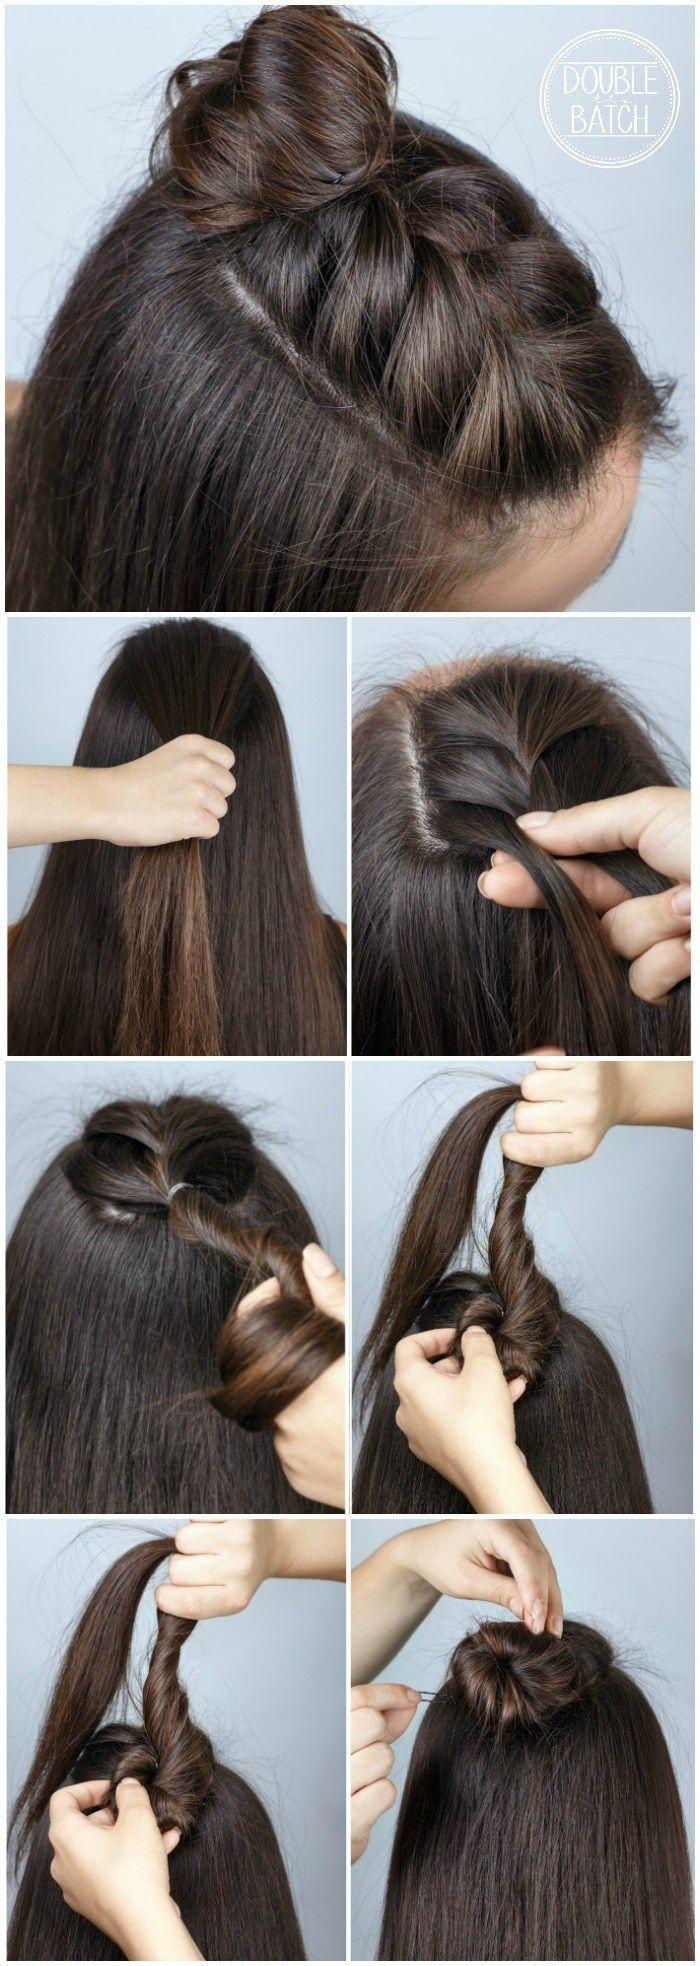 Diy half braid hairstyle tutorial such an easy and quick hair idea